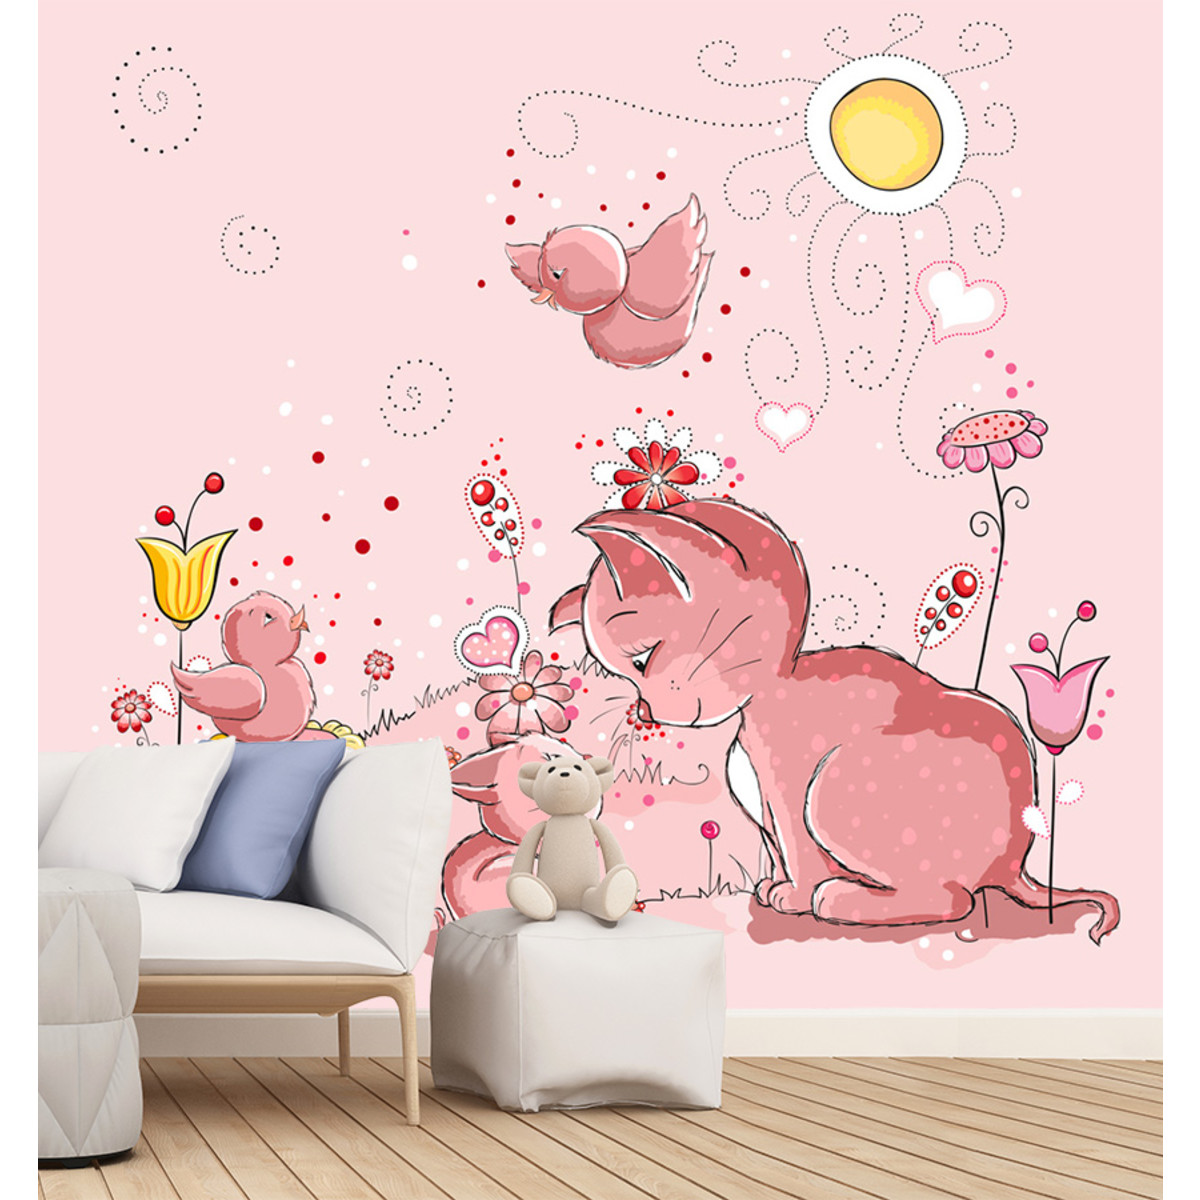 Фотообои Barton Wallpapers Детские K13903 300х270 см